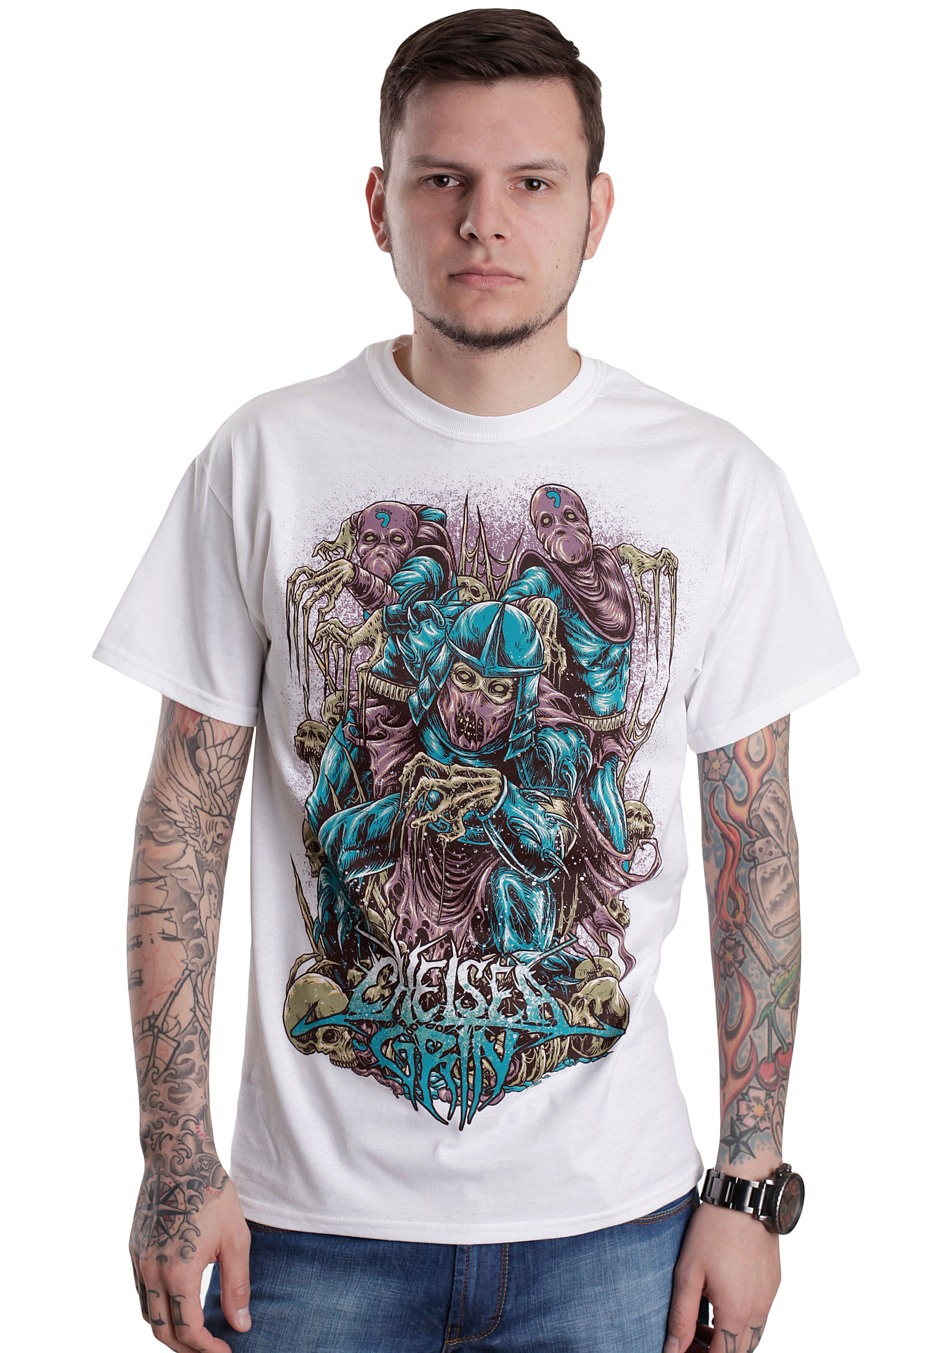 chelsea grin deathsquad white t shirt official metalcore merchandise worldwide. Black Bedroom Furniture Sets. Home Design Ideas